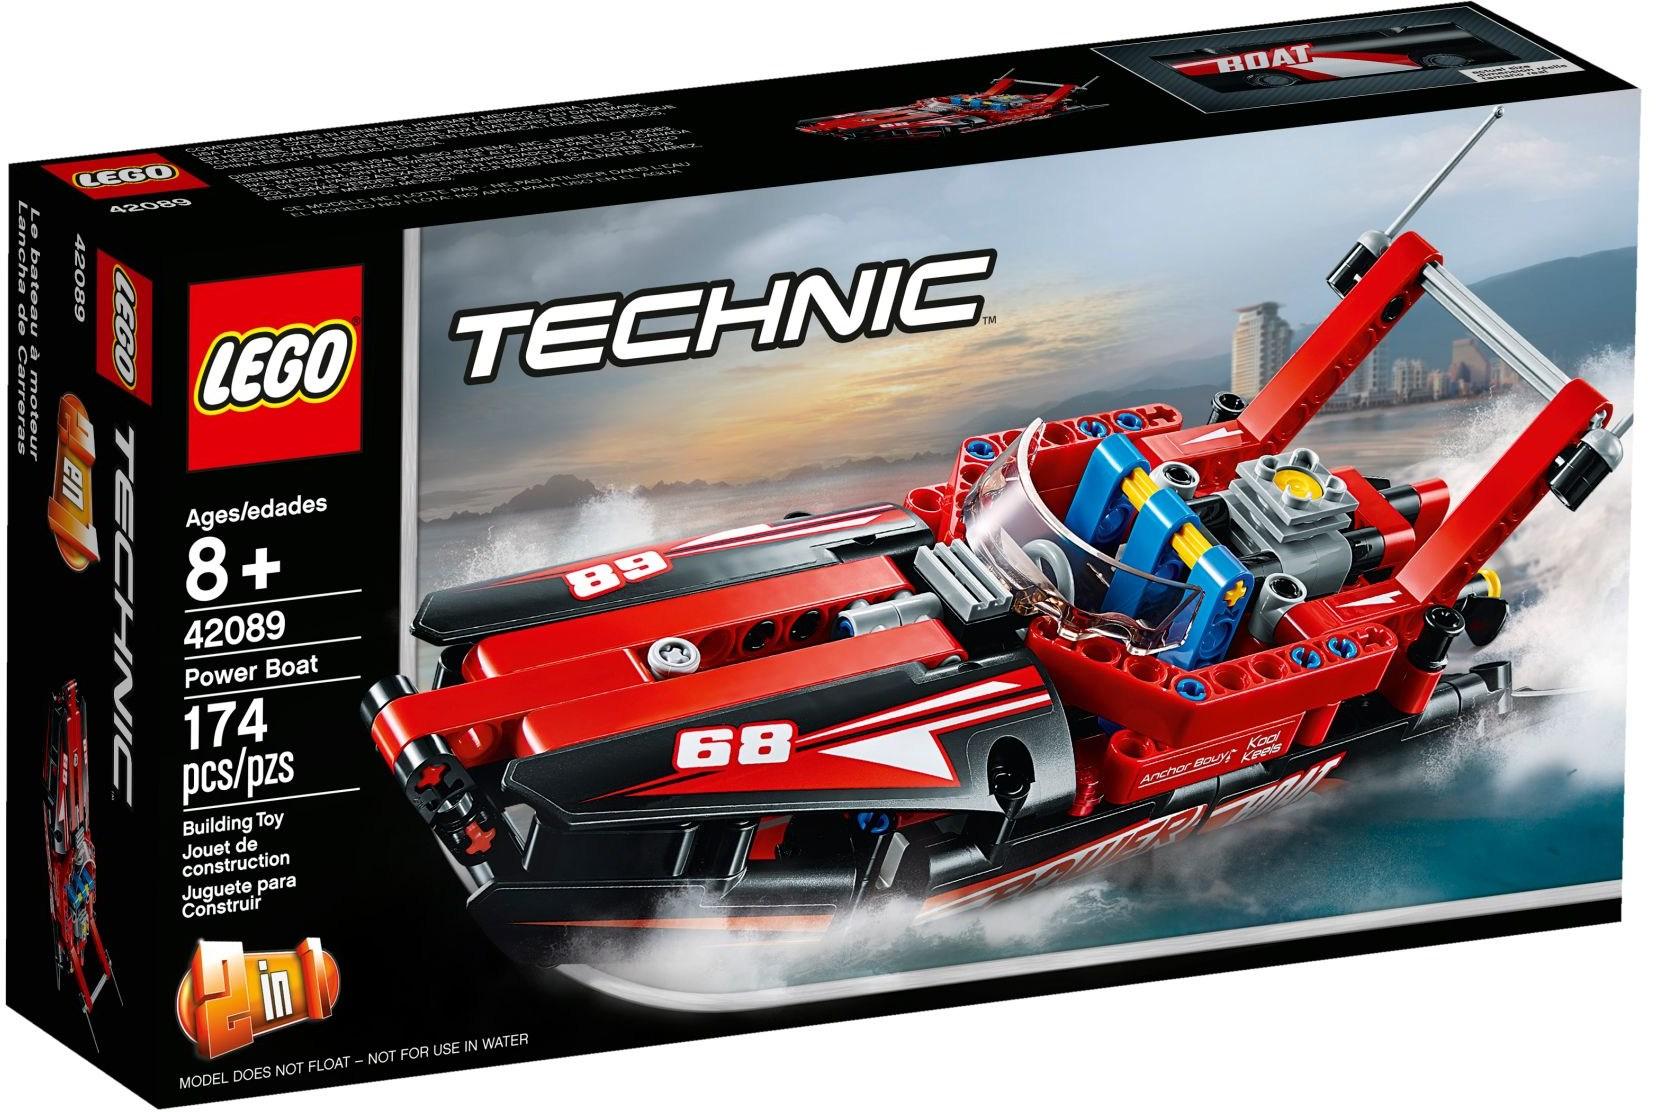 LEGO POWER BOAT - 42089